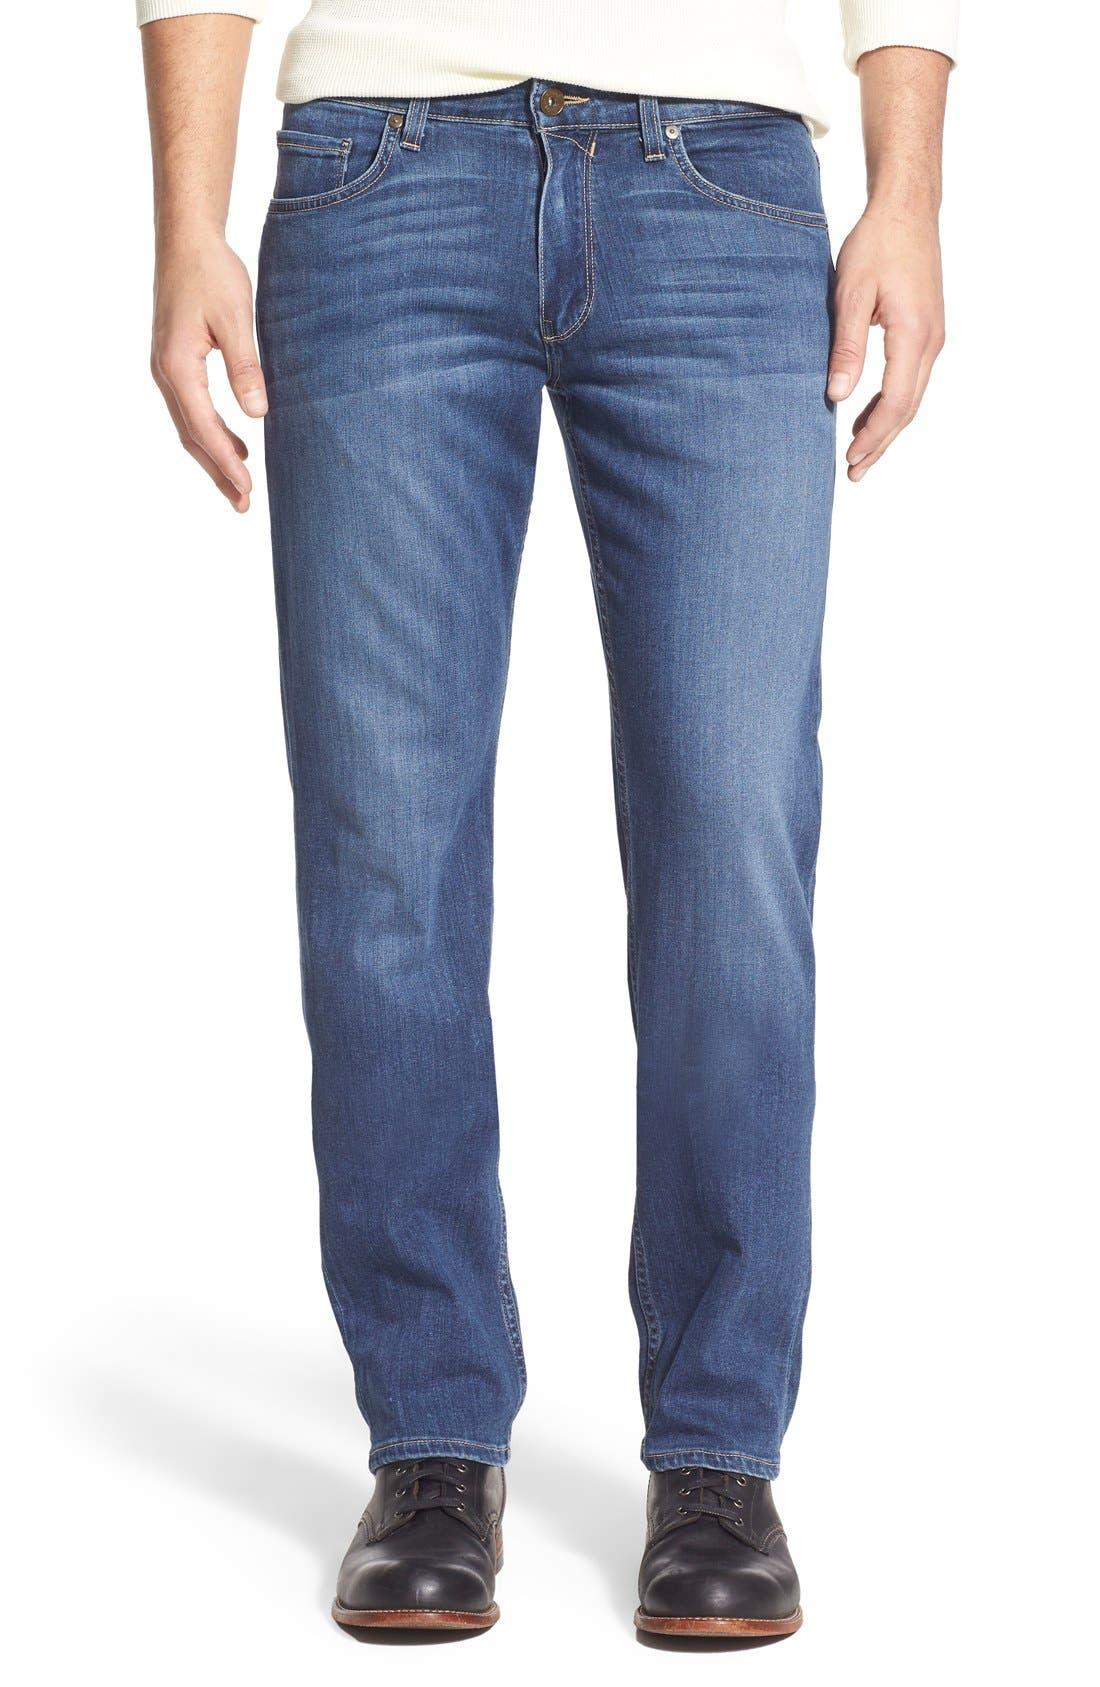 Transcend - Lennox Straight Leg Jeans,                             Main thumbnail 1, color,                             BIRCH